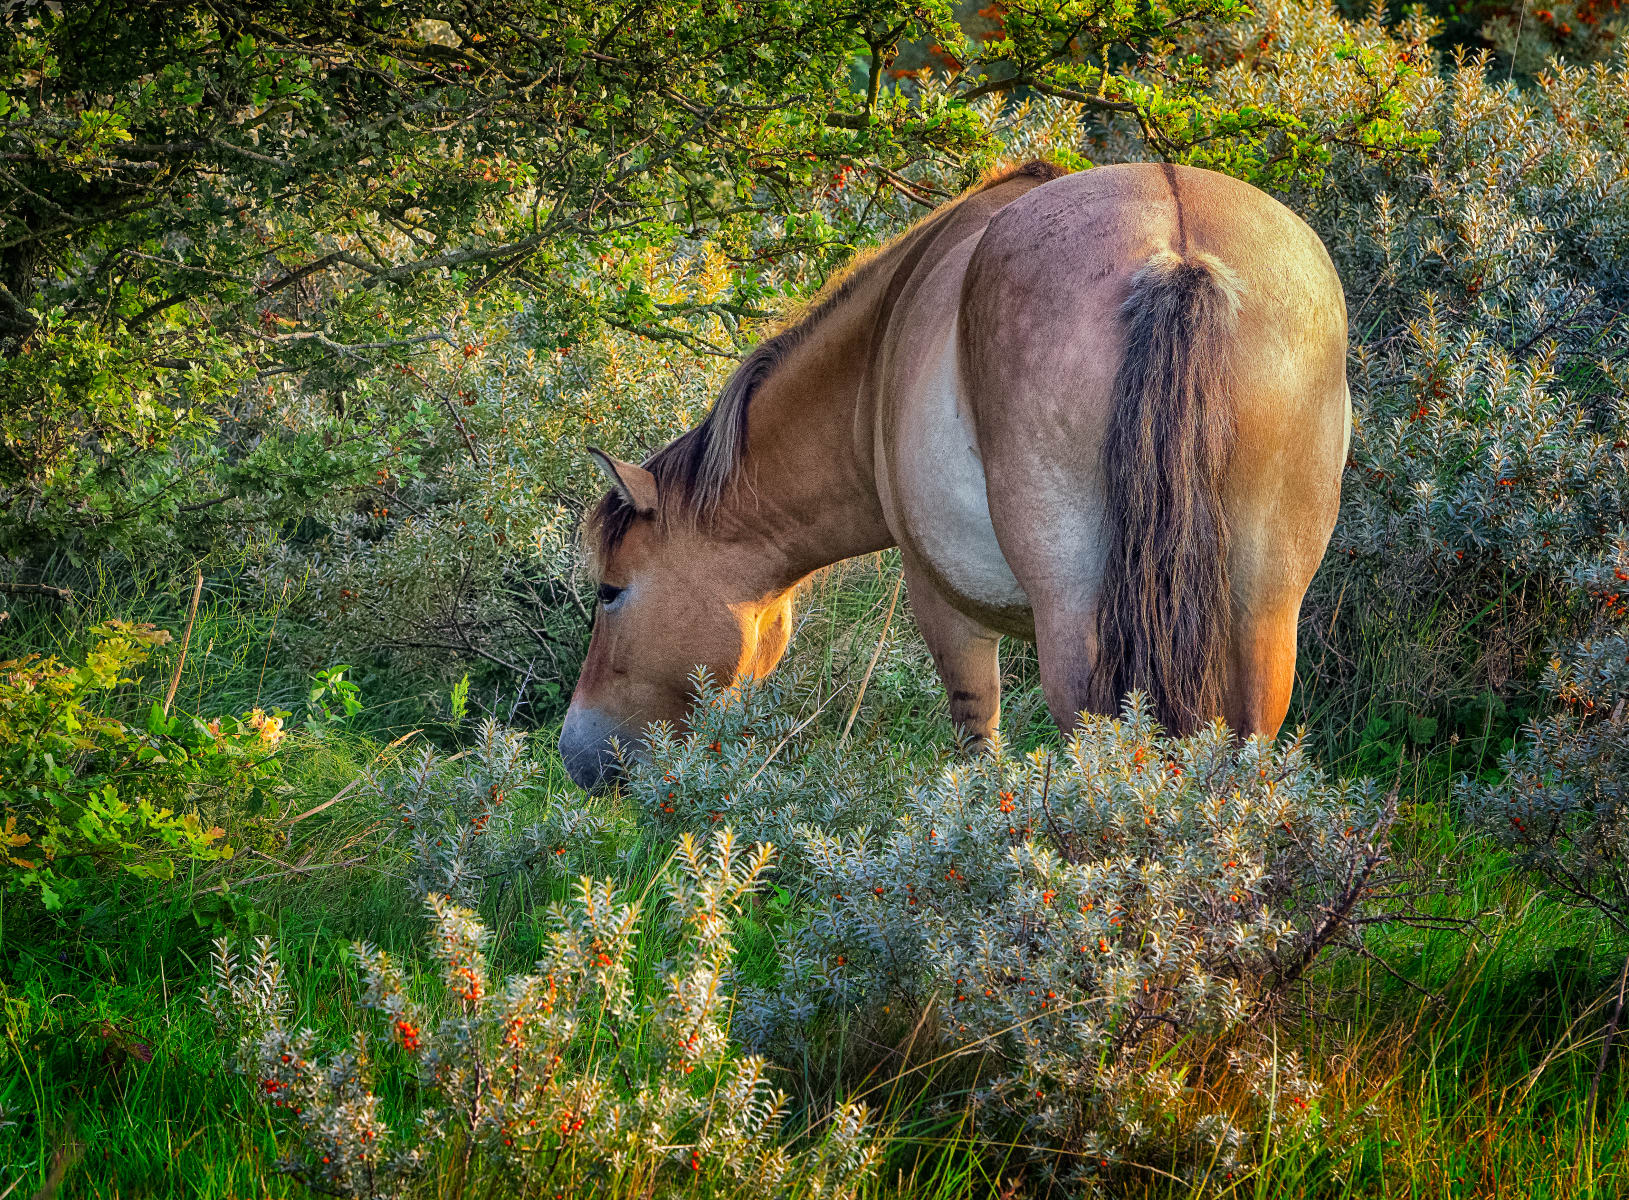 intimate grazing spot